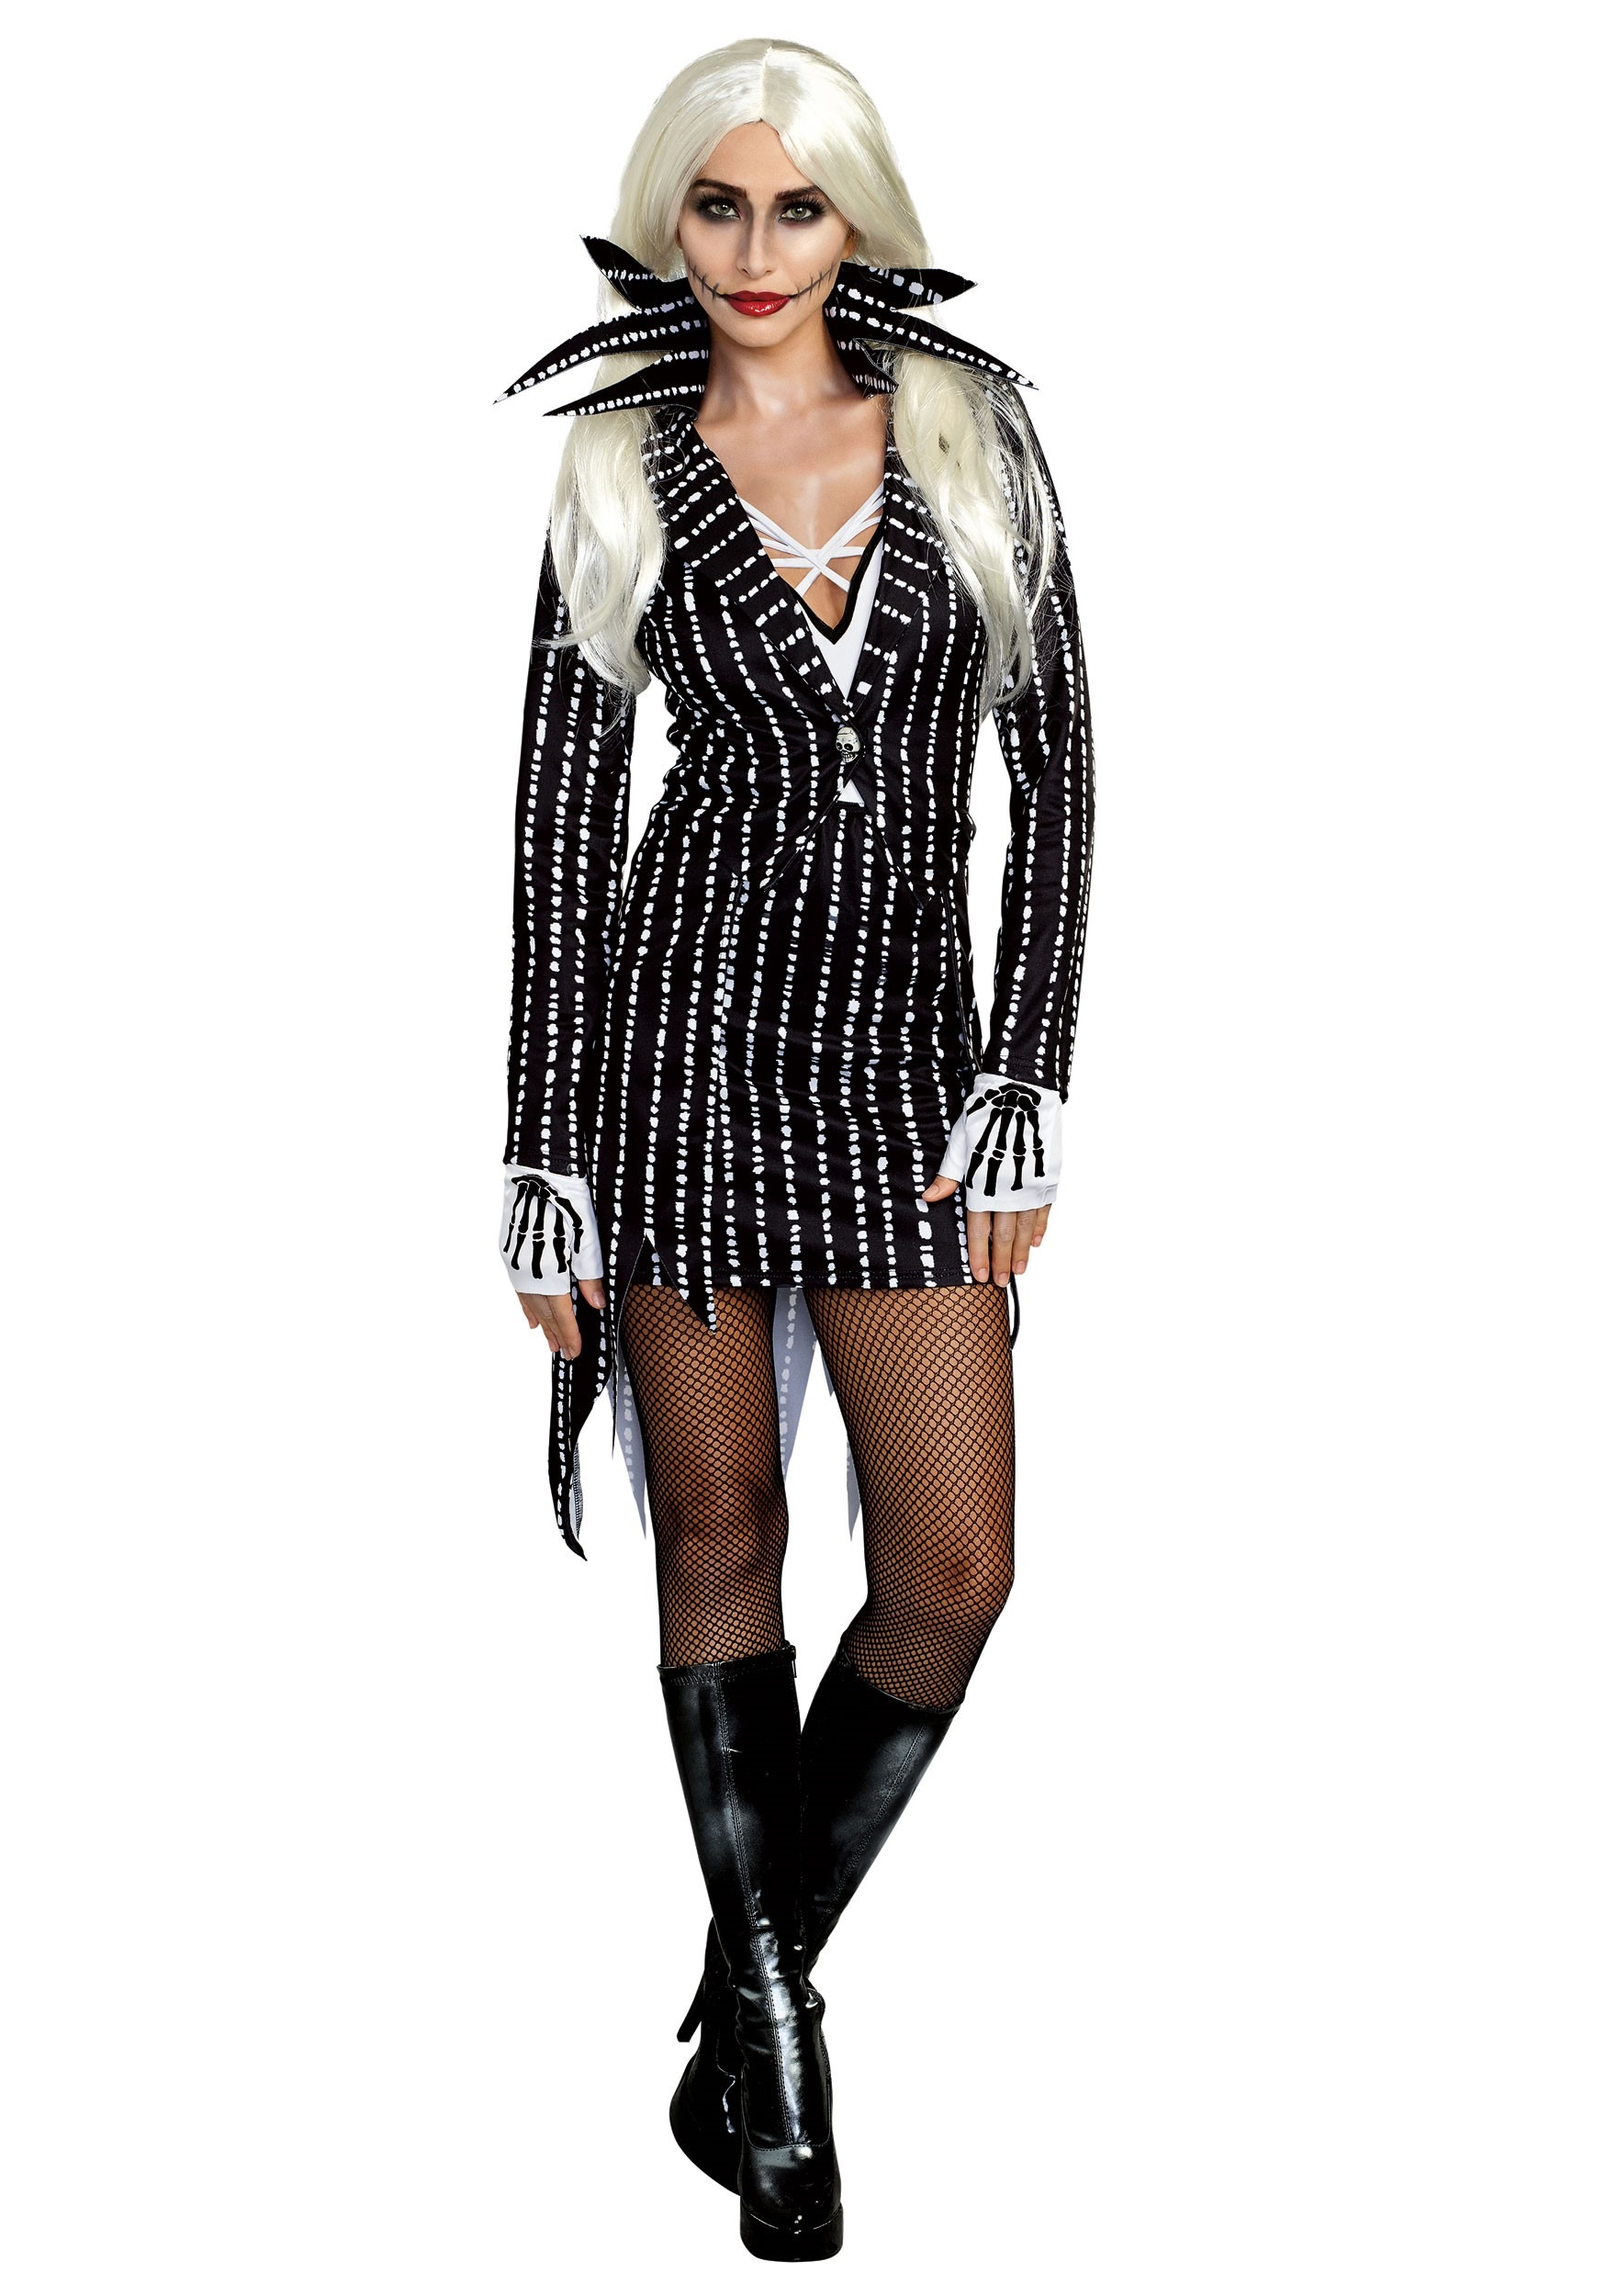 Madame Skeleton Costume for Women